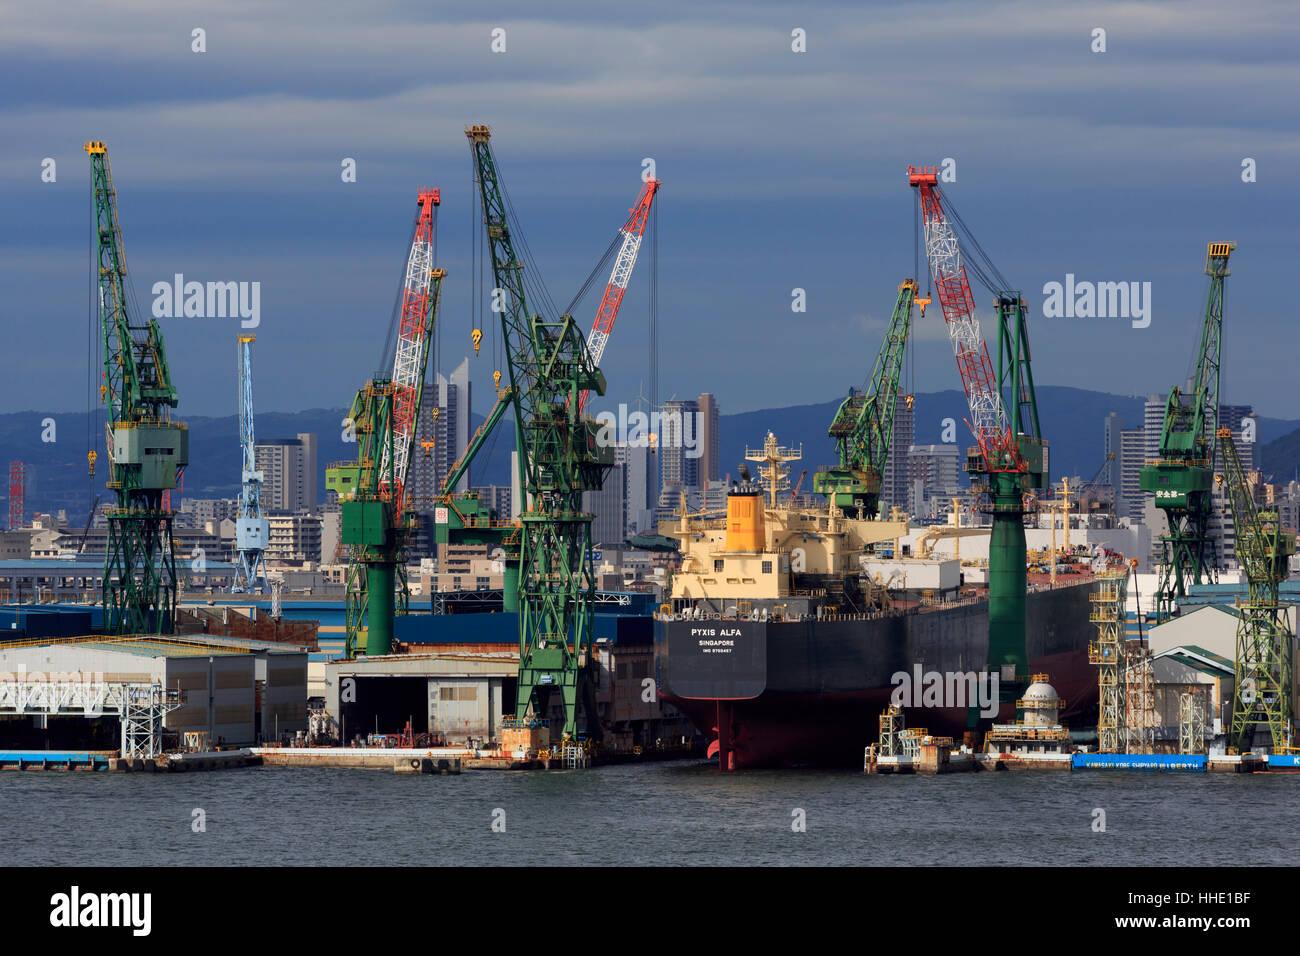 Kawasaki Kobe Shipyard, Honshu Island, Japan - Stock Image